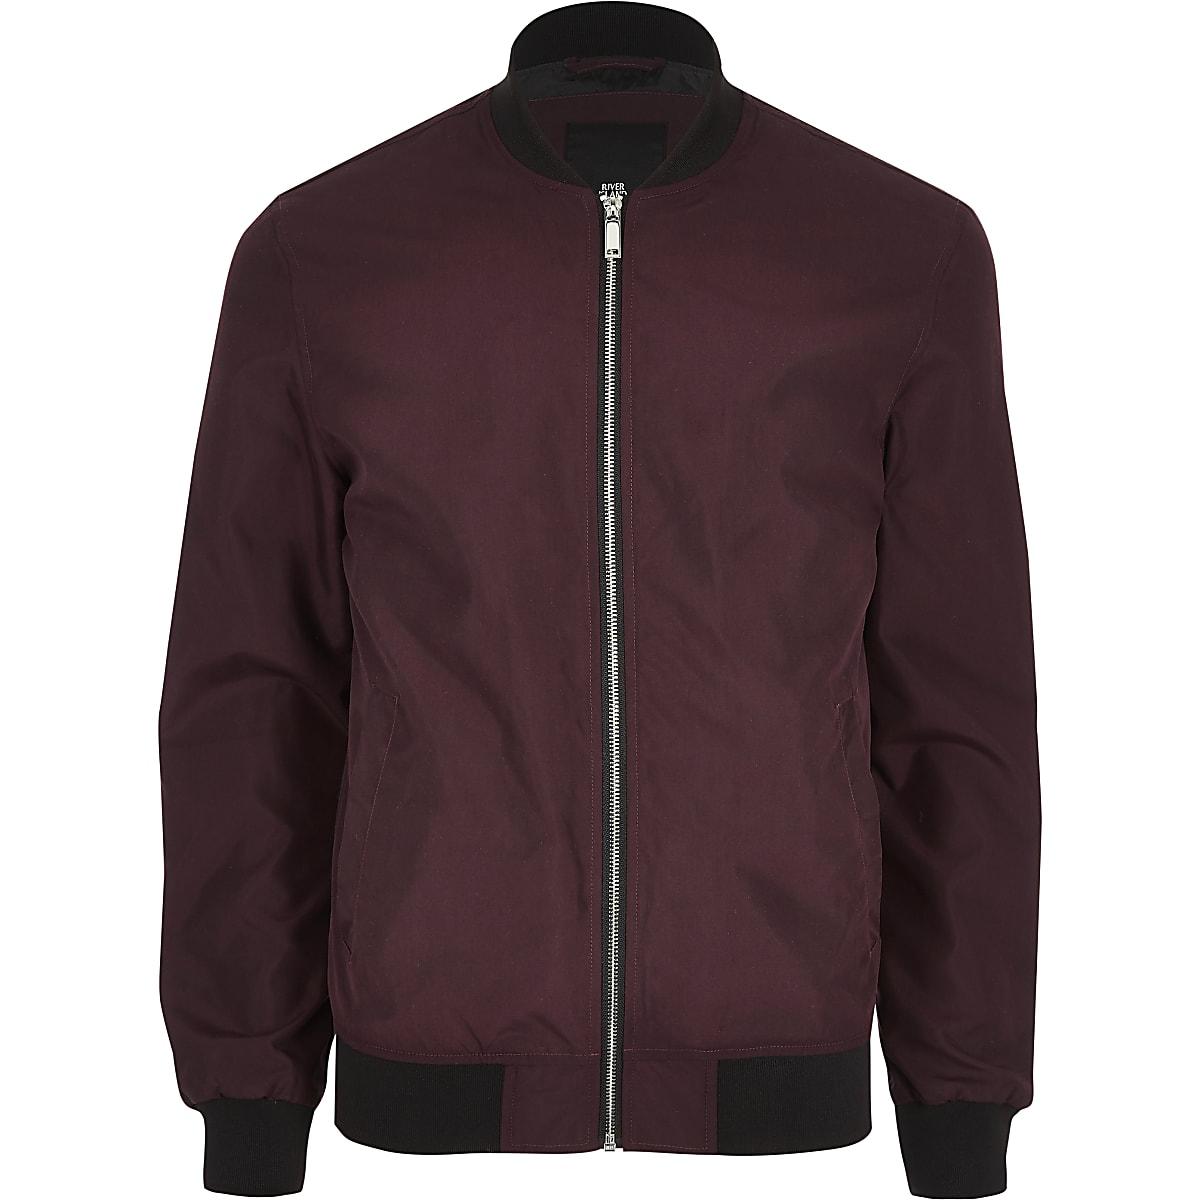 3d01869d5b52 Dark red bomber jacket - Jackets - Coats   Jackets - men